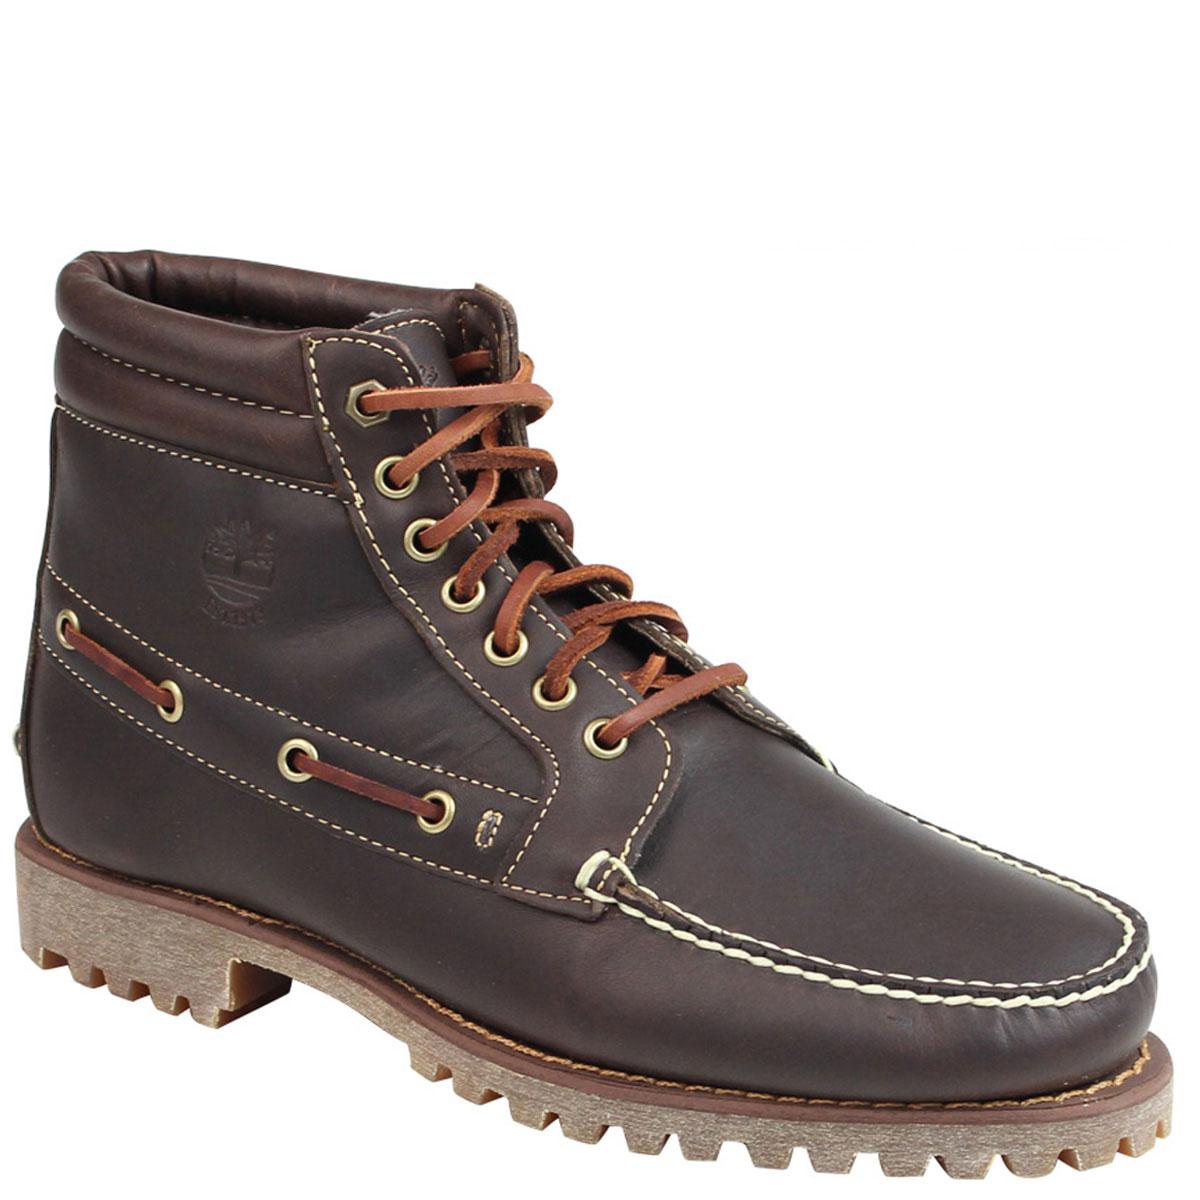 7 Timberland Timberland PENDLETON AUTHENTICS 7 EYE CHUKKA chukka boots authentic アイチャッカ A13F1 W Wise dark brown men